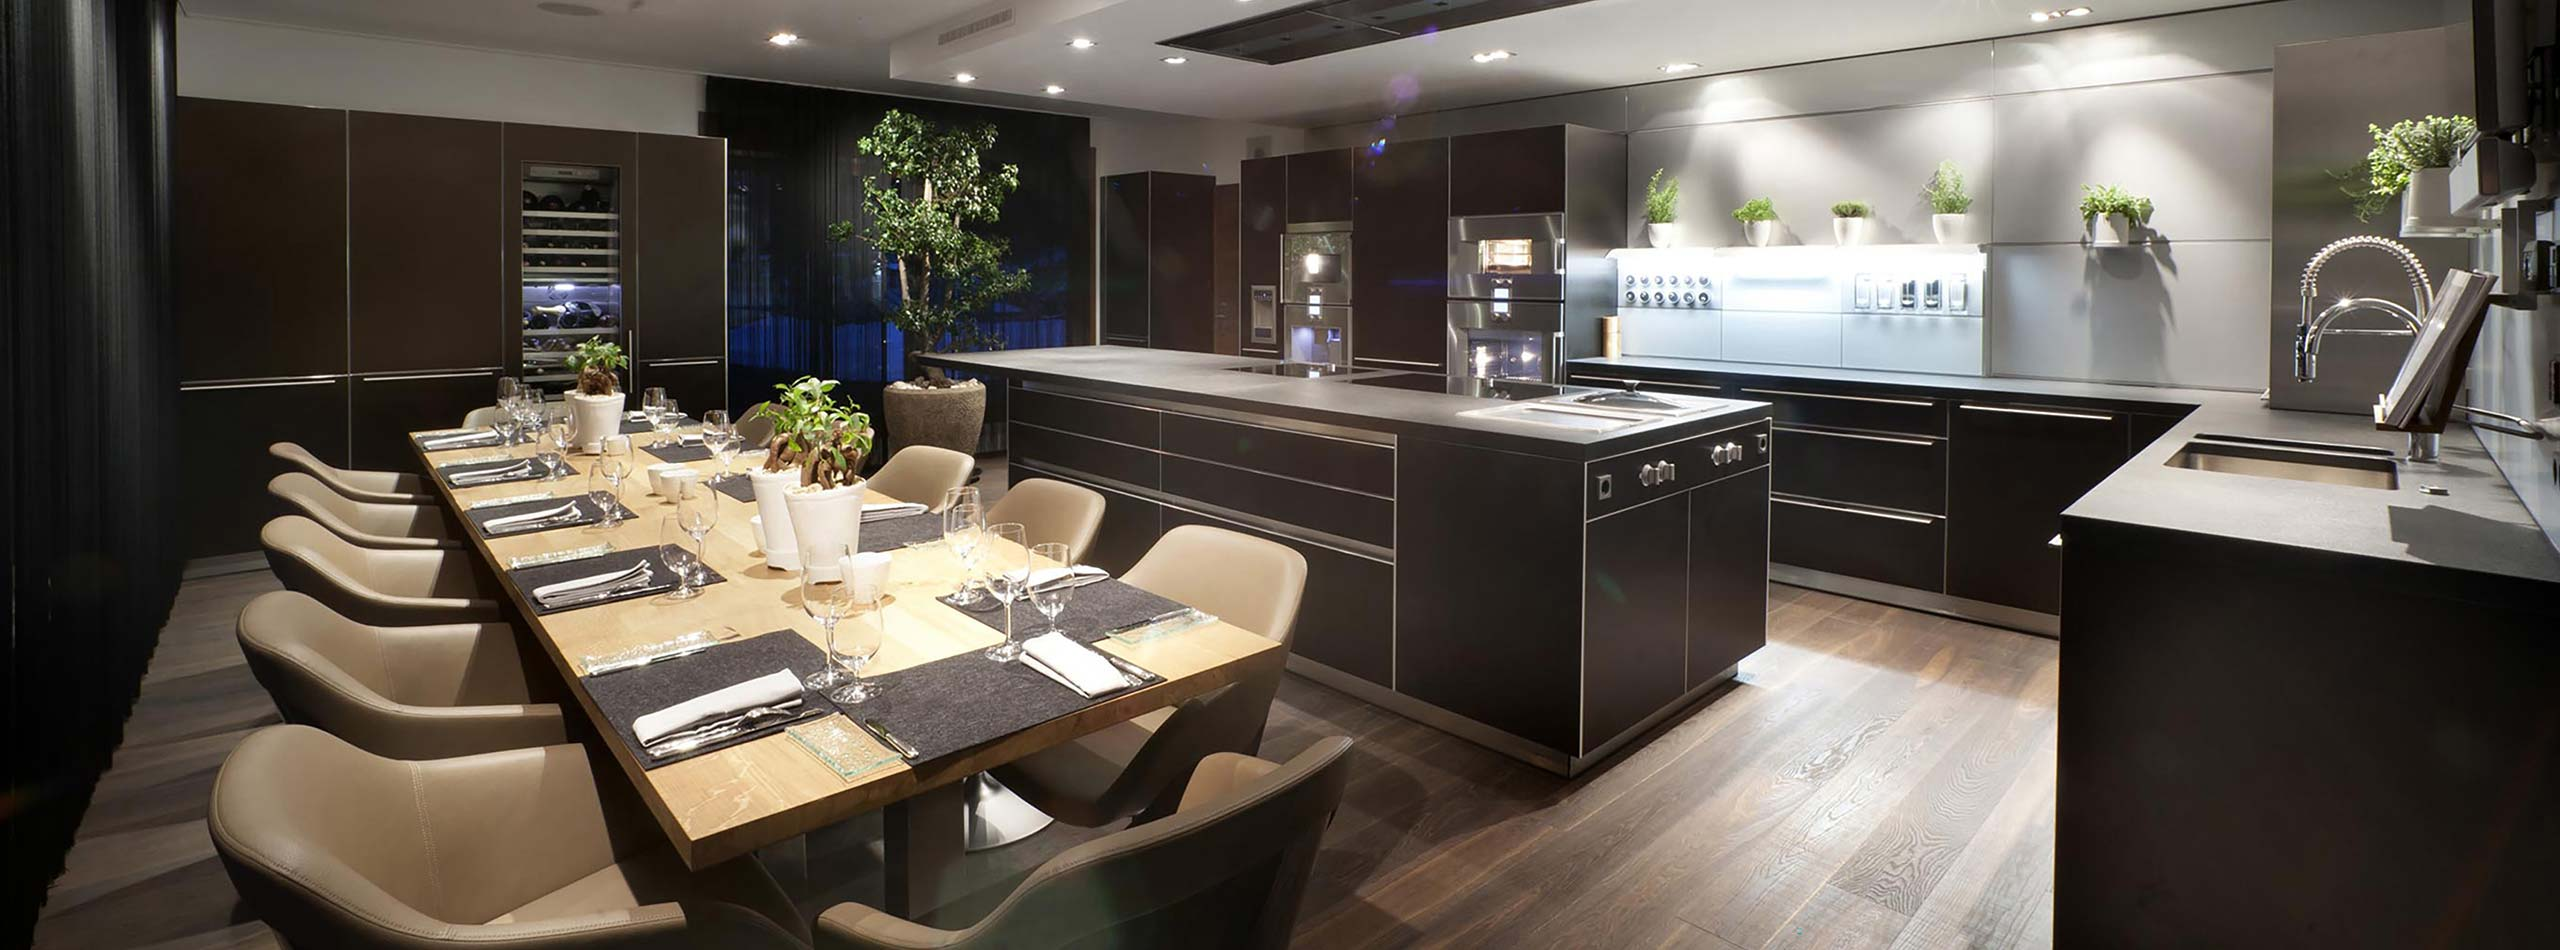 Culinary 5-star luxury hotel Rosengarten Kirchberg Tyrol